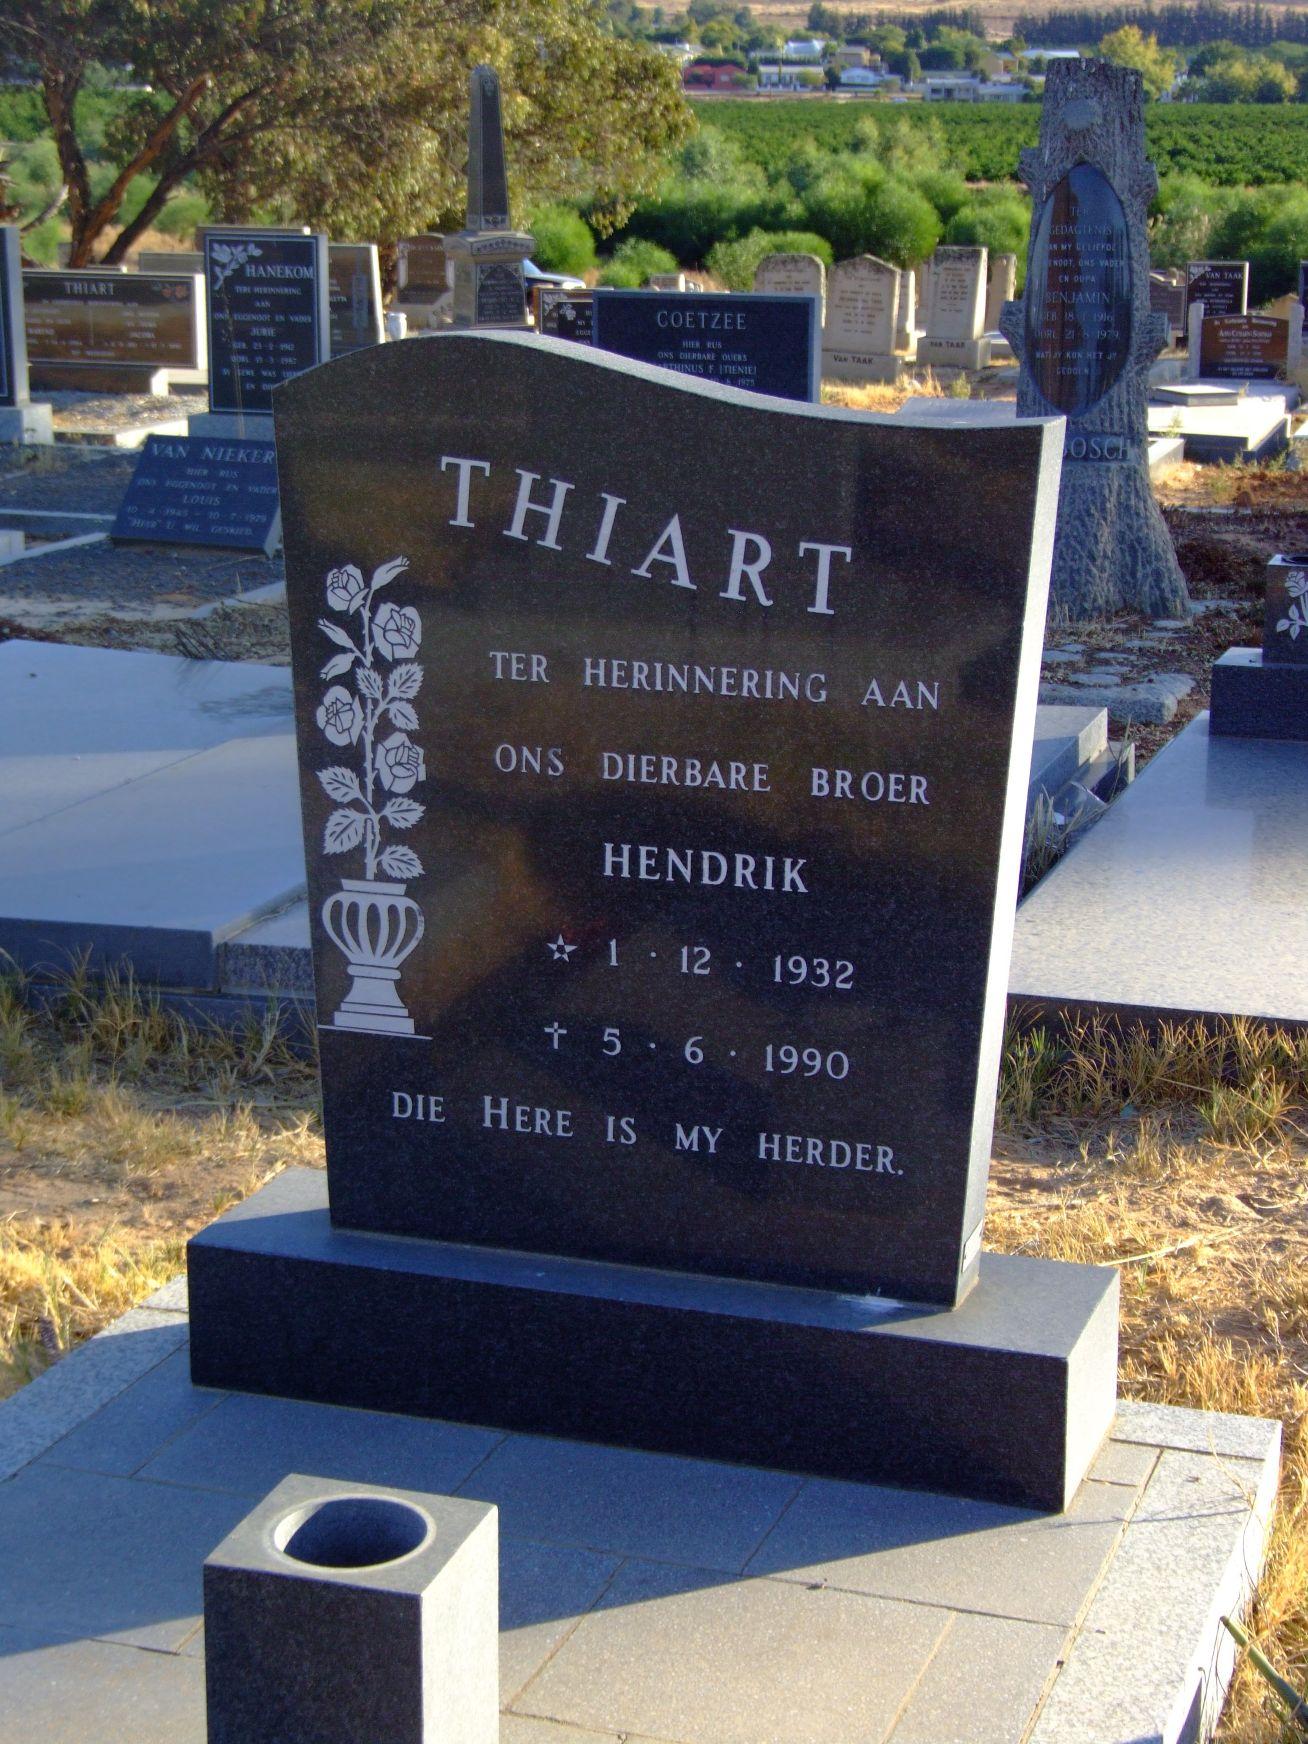 Thiart, Hendrik